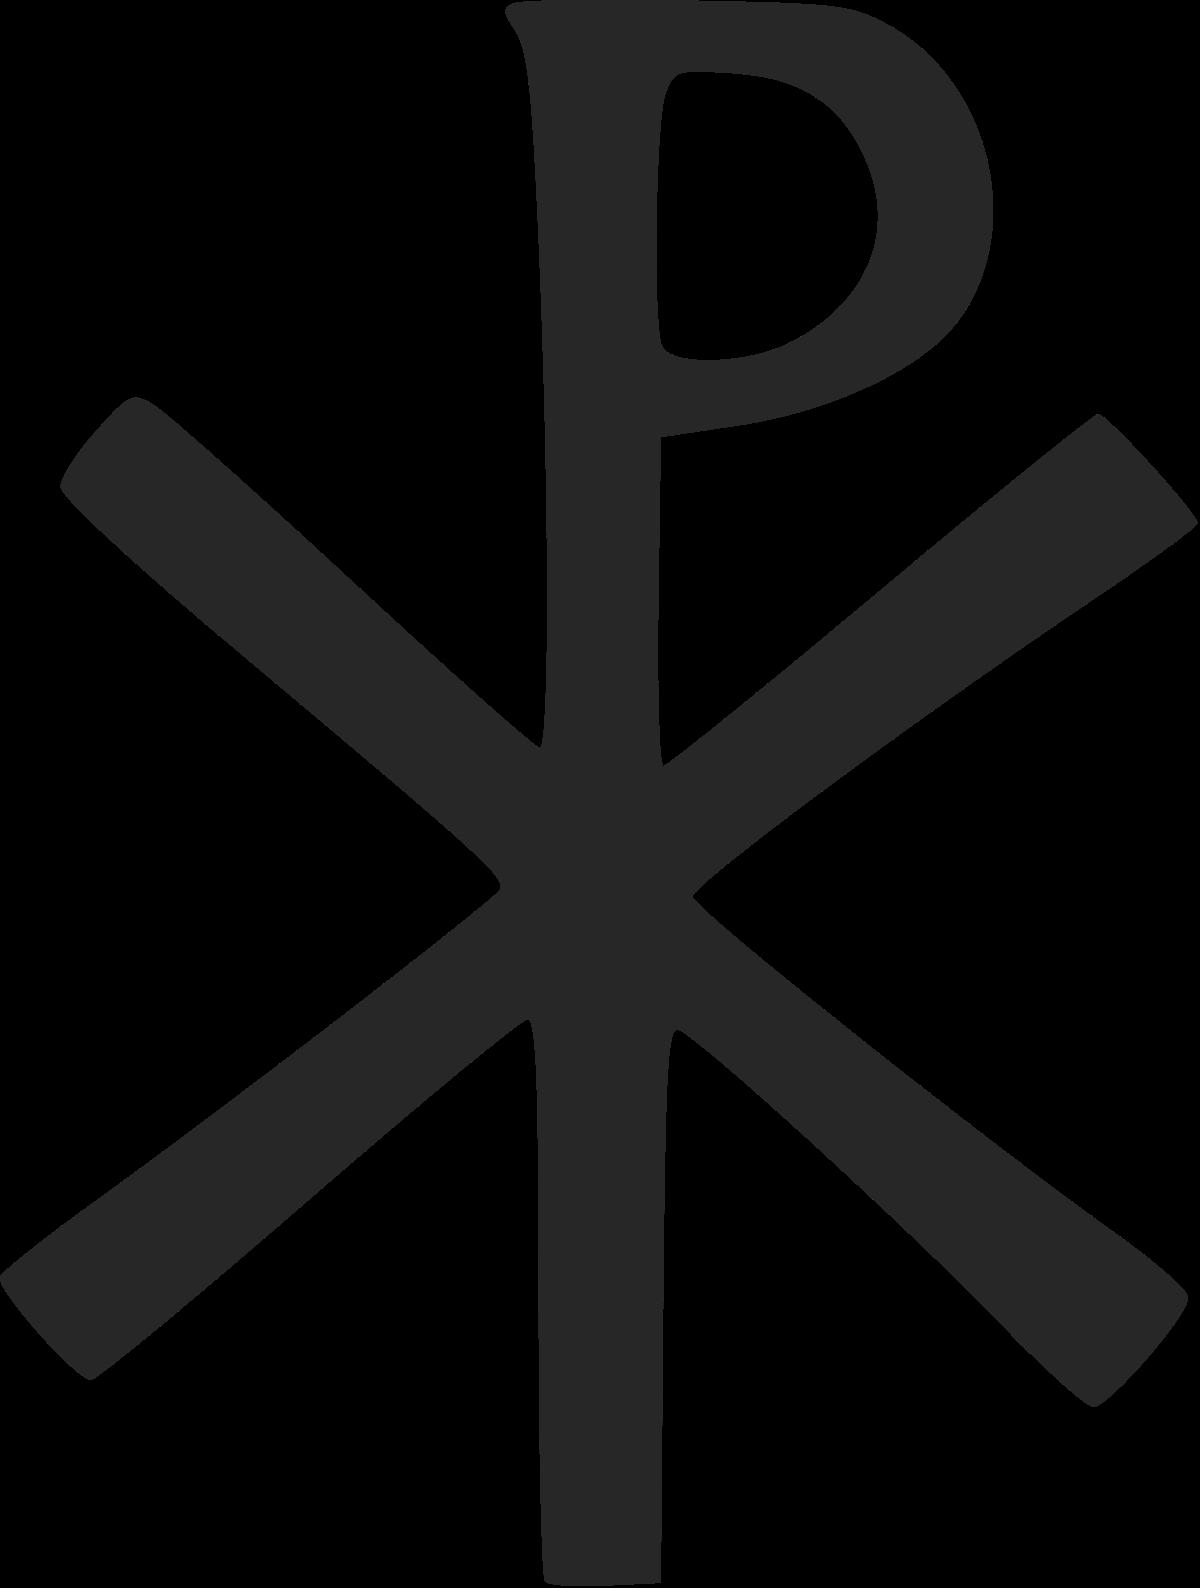 Link chi rho symbol. Crucifix clipart girly